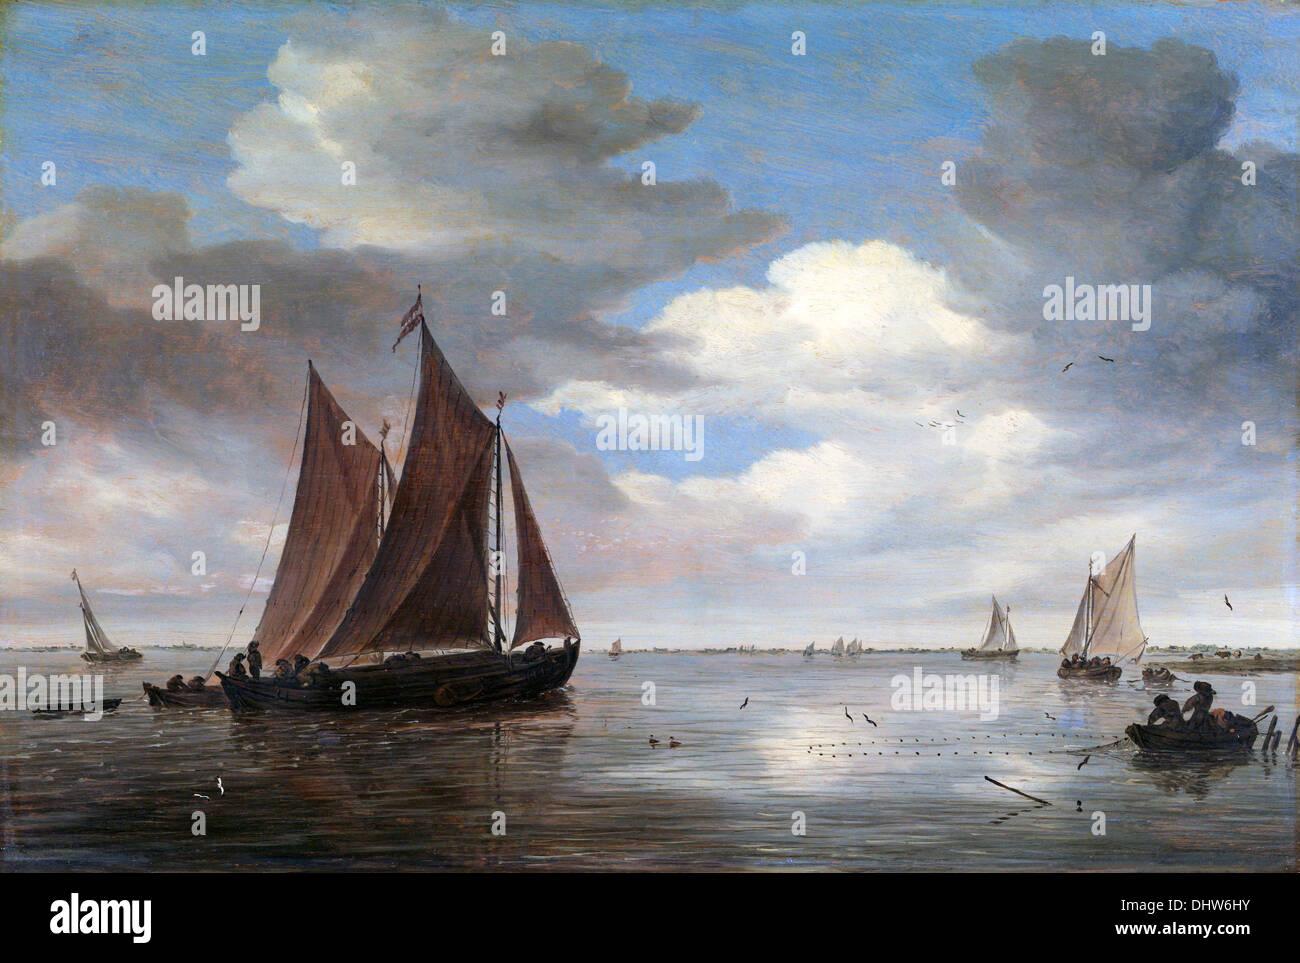 Fishing Boats on a River - by Salomon van Ruysdael, 1660's Stock Photo